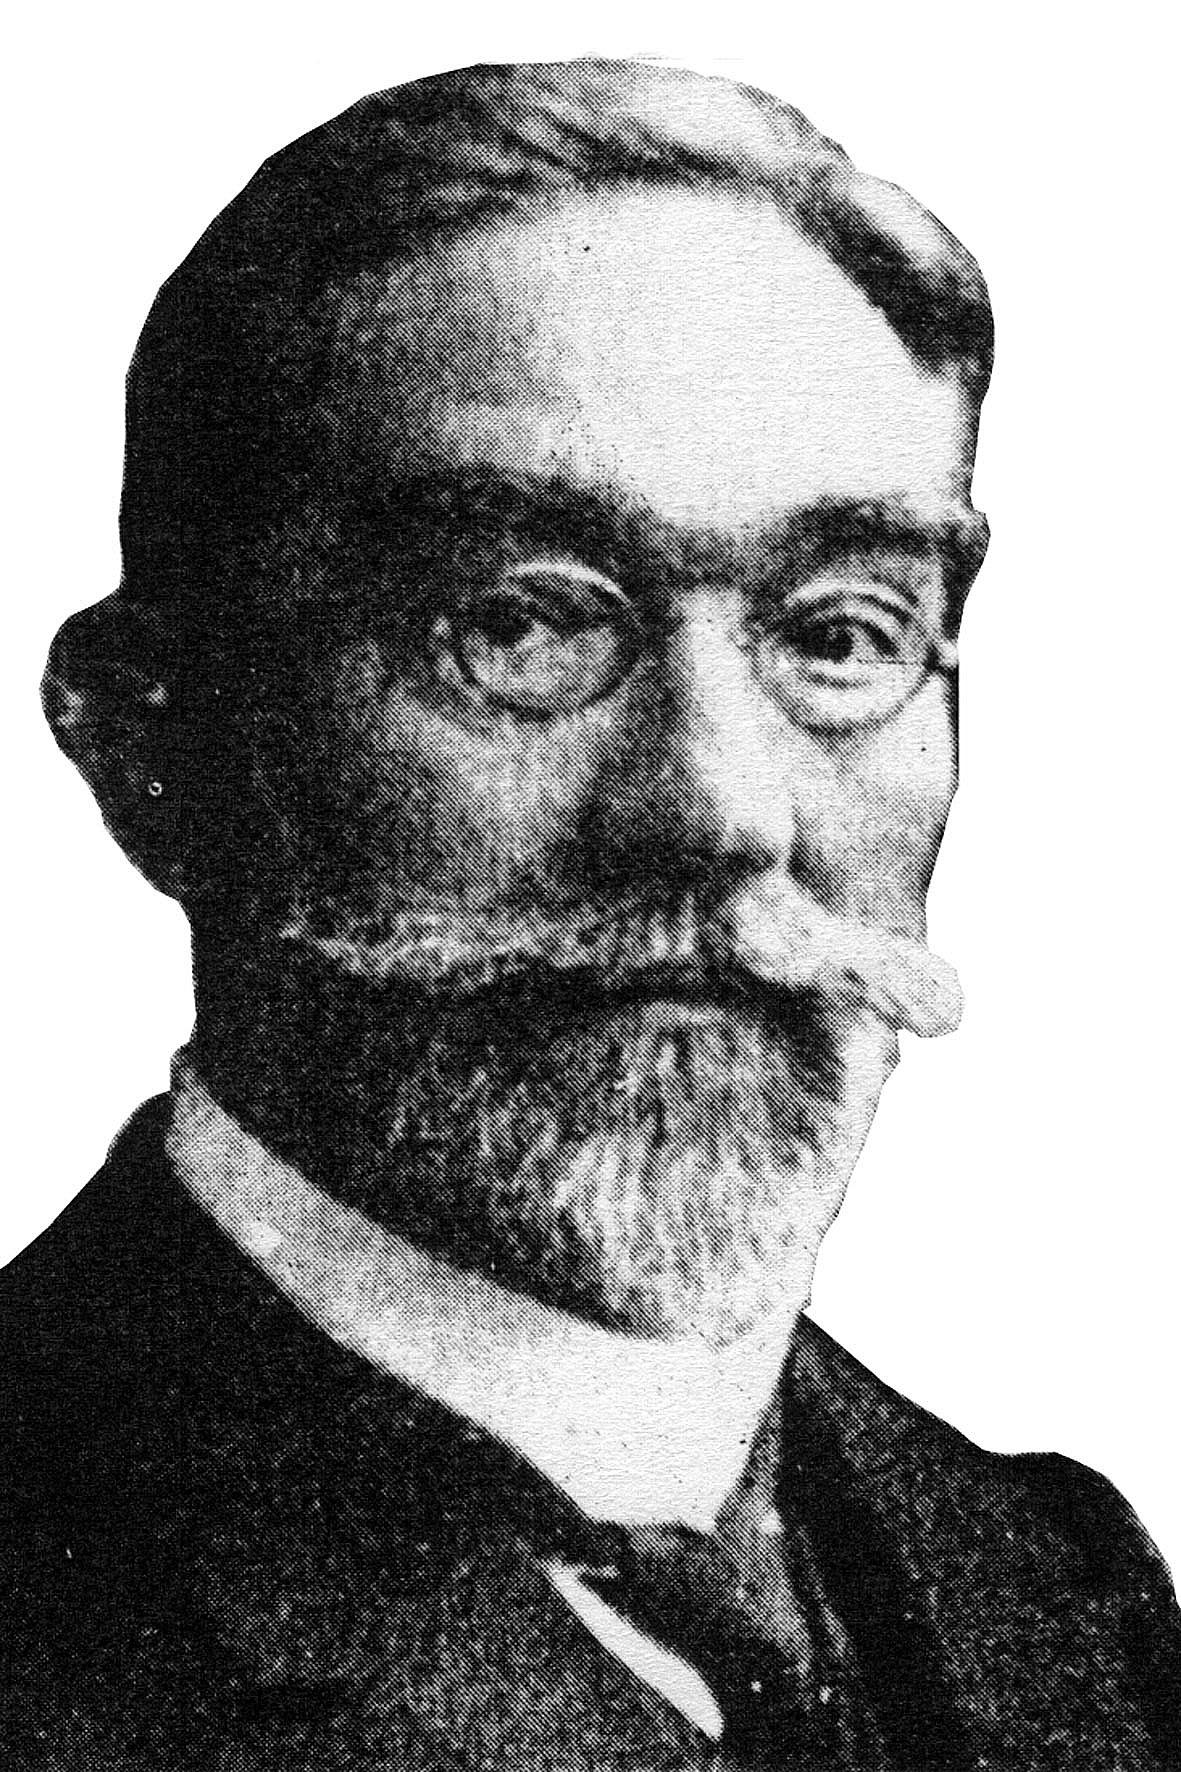 prof. dr Hugo Jentsch (1840 - 1916)